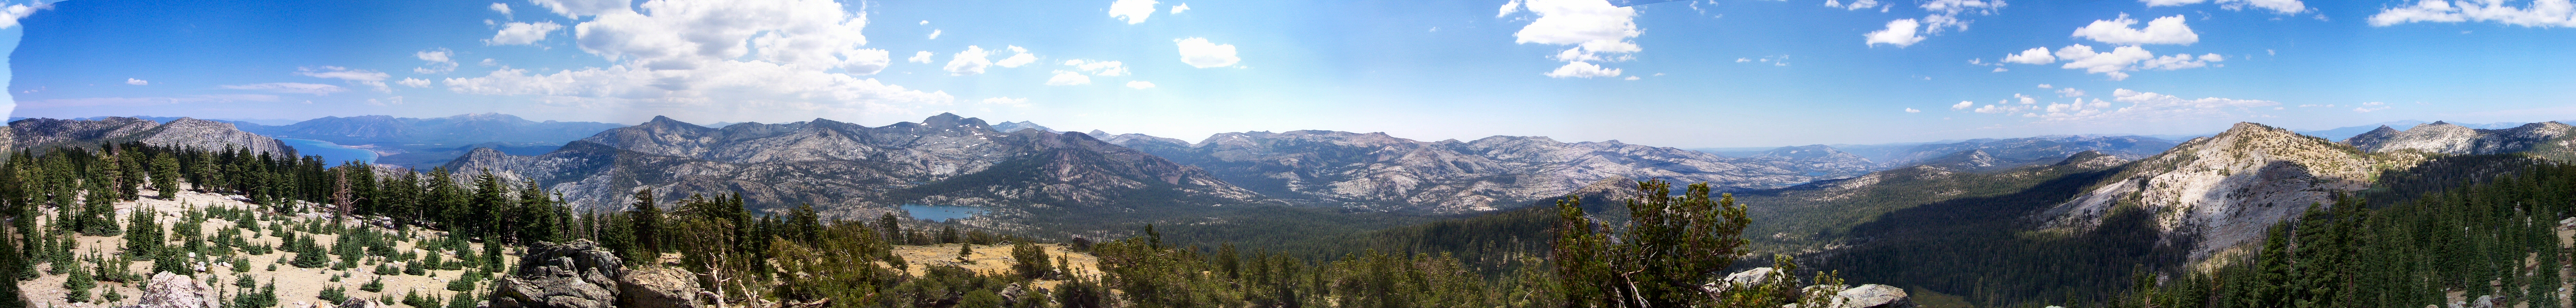 Phipps Peak